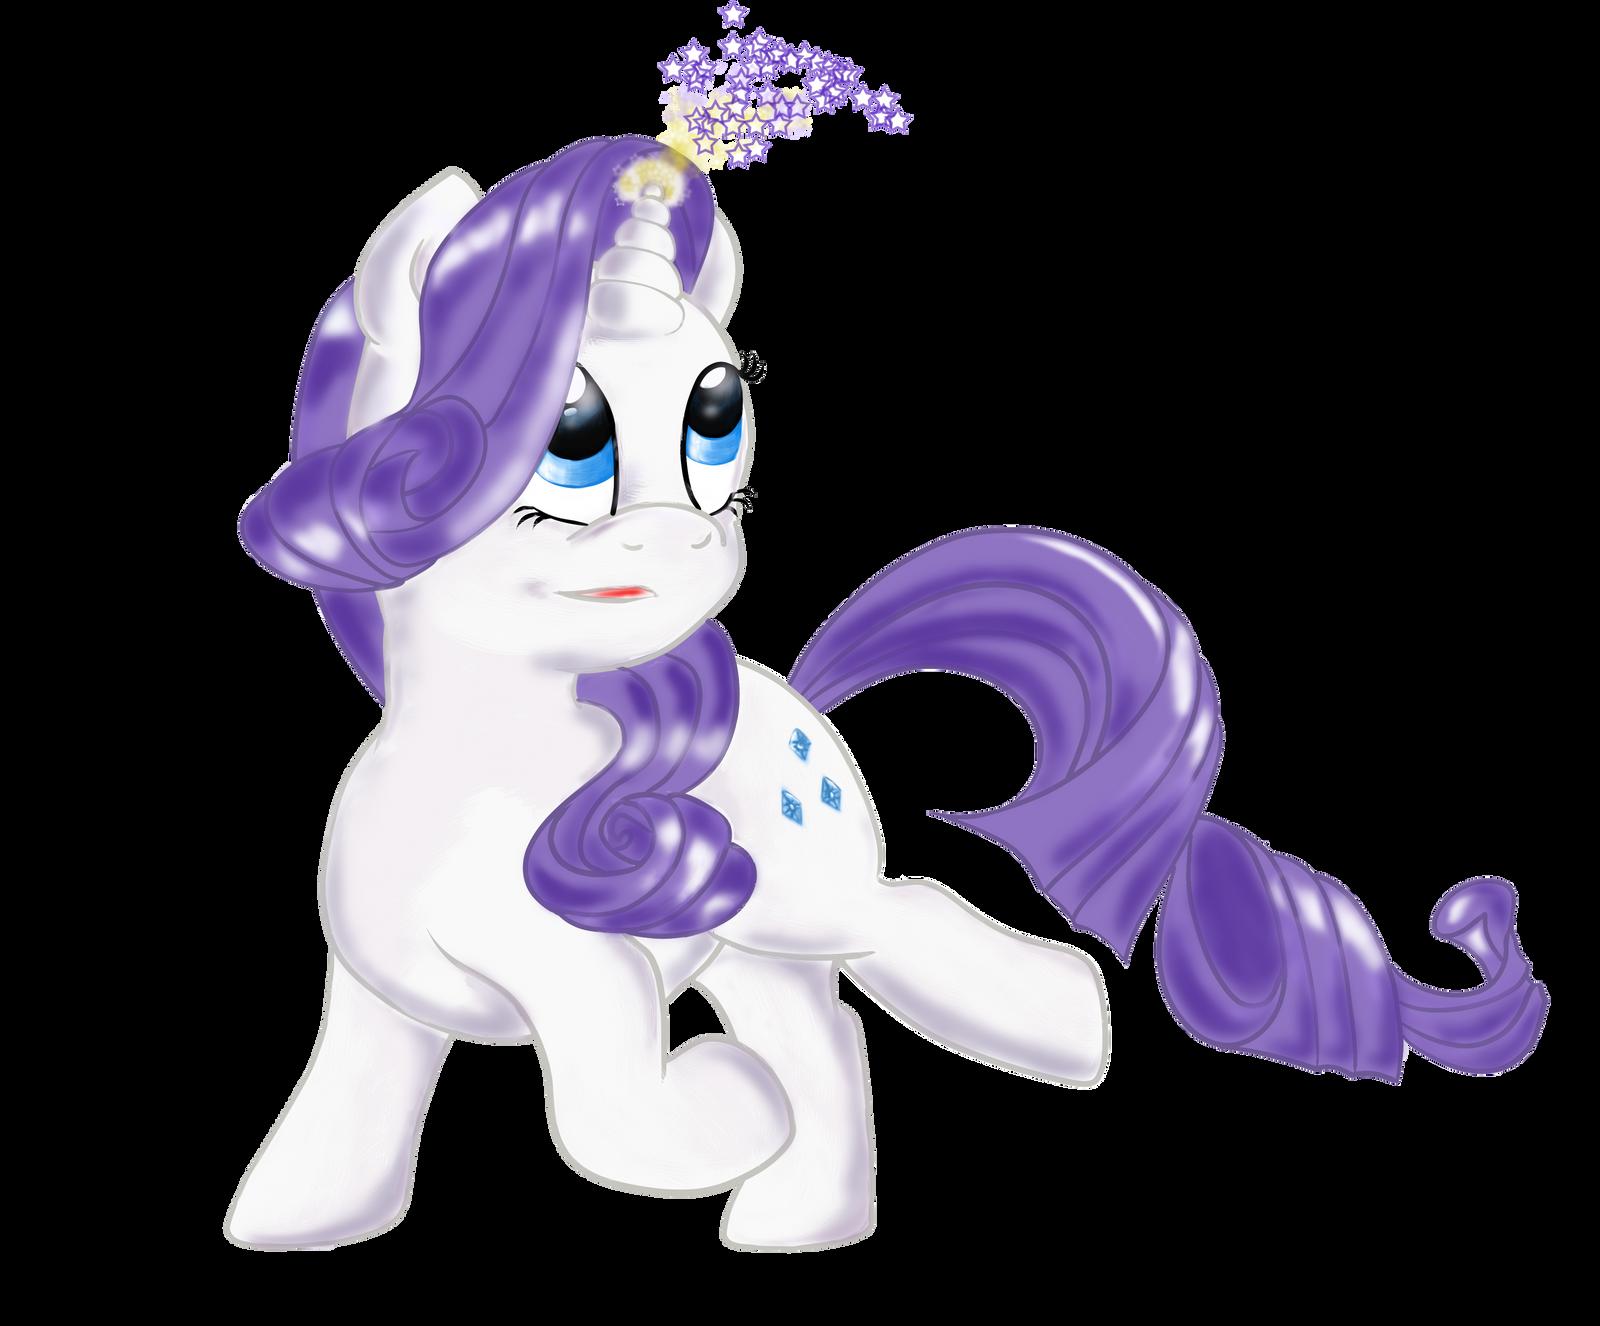 Chibi Rarity My Little Pony by aprilj0313 on DeviantArt